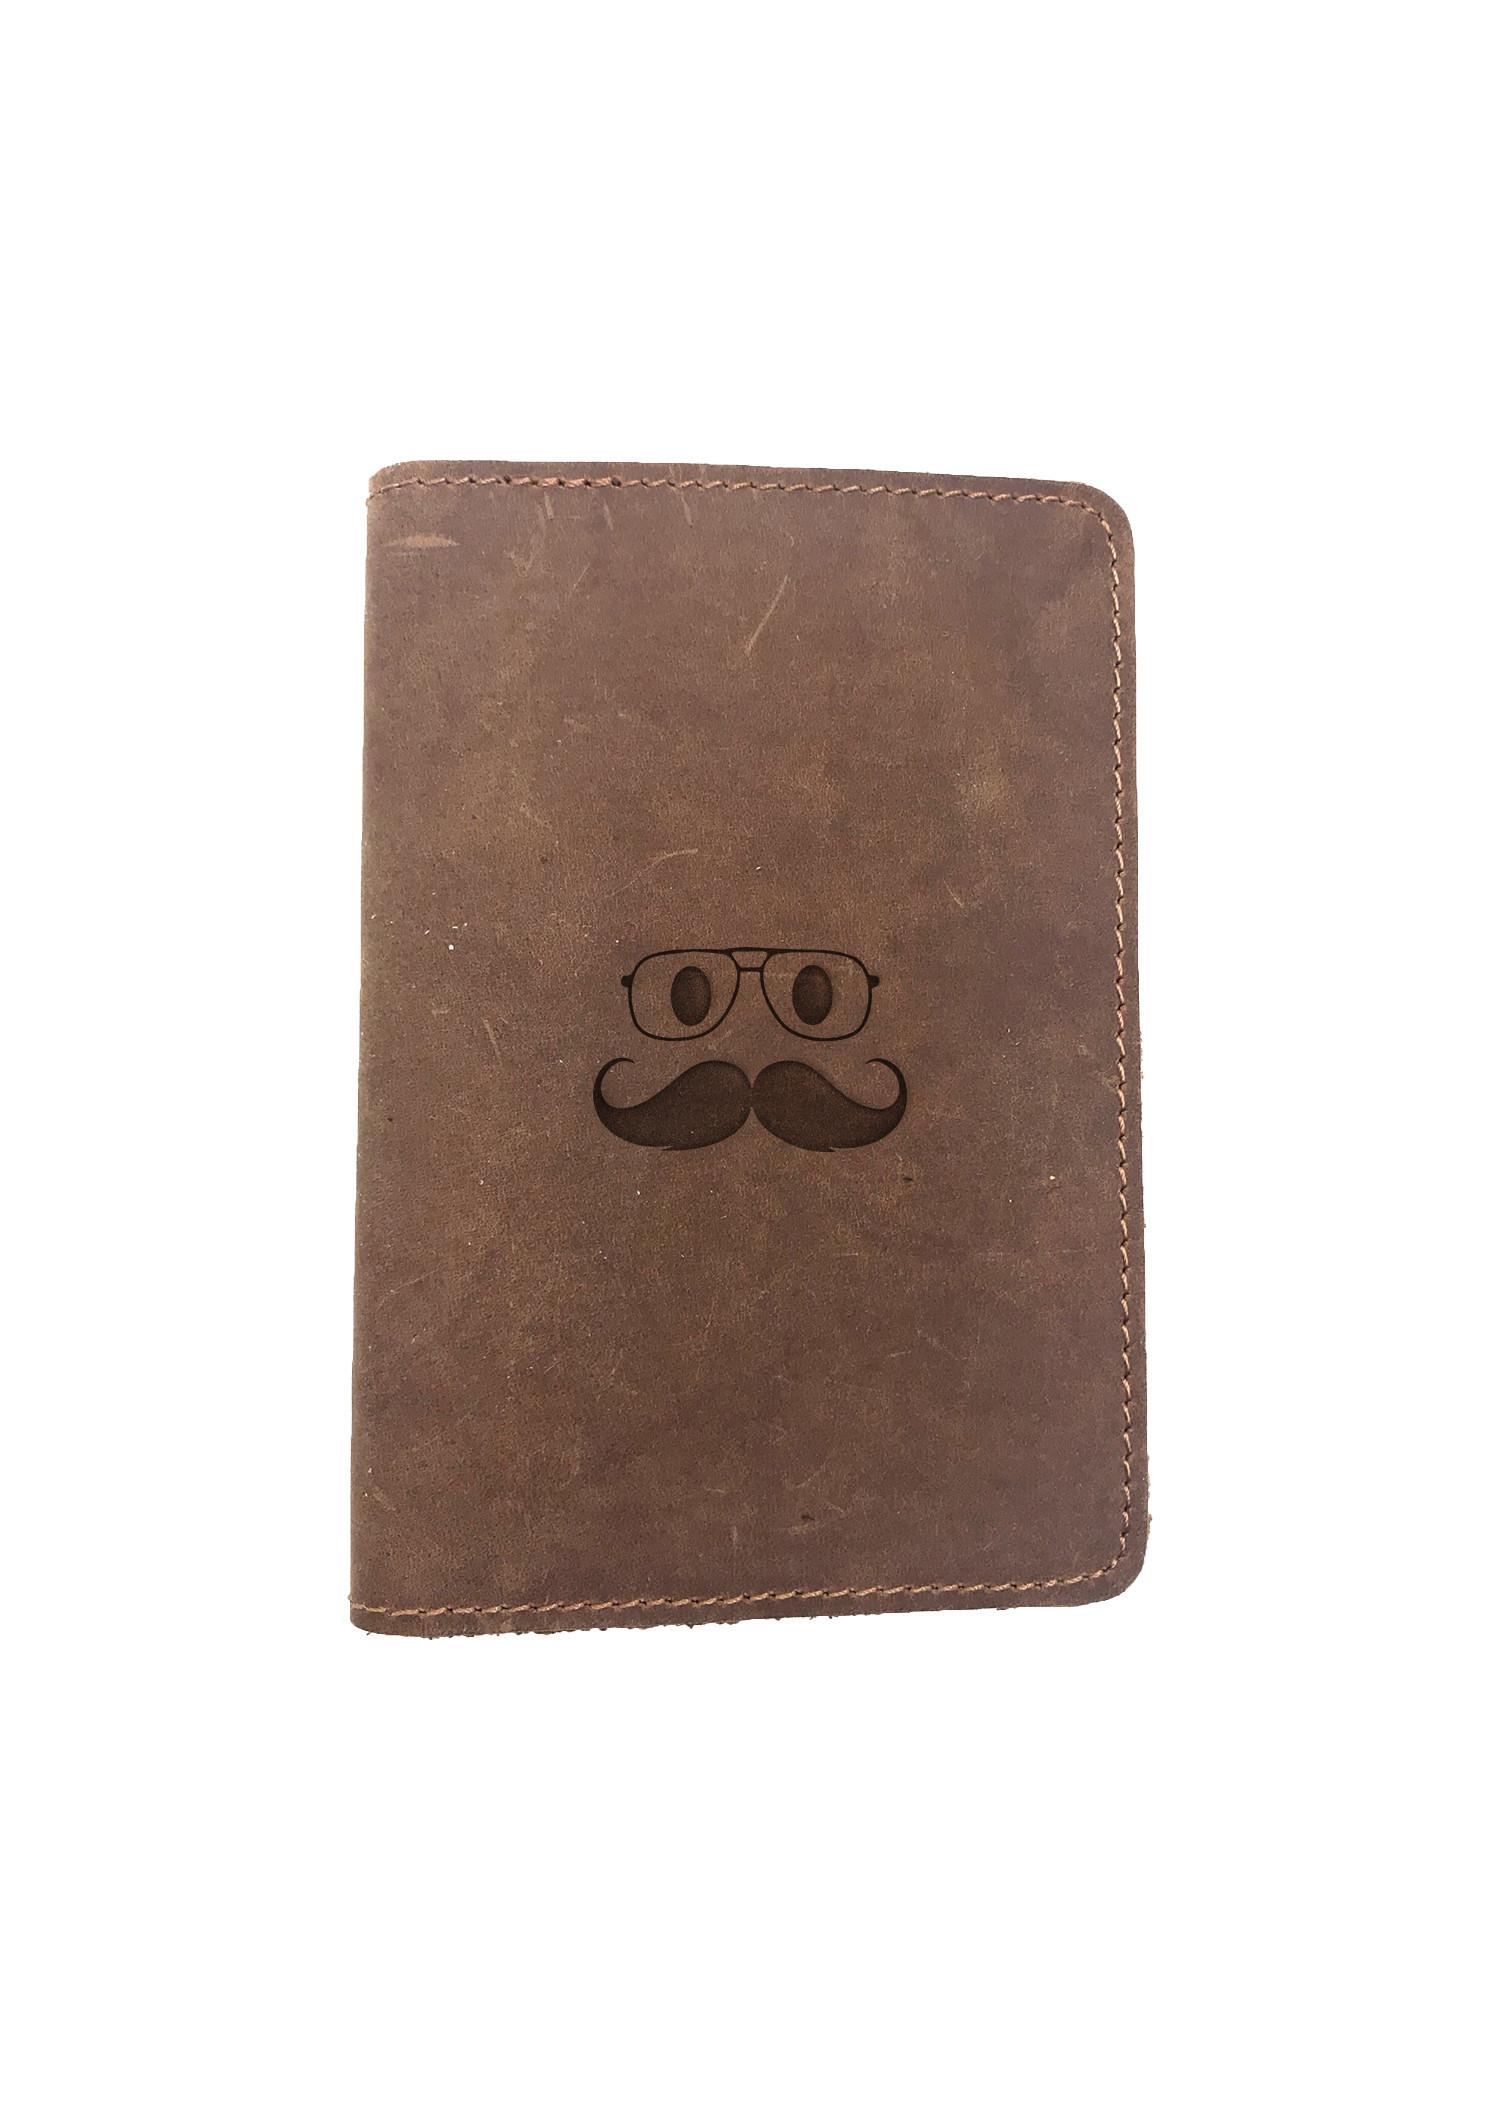 Passport Cover Bao Da Hộ Chiếu Da Sáp Khắc Hình Gương mặt MUSTACHE GLASSES FACE (BROWN)